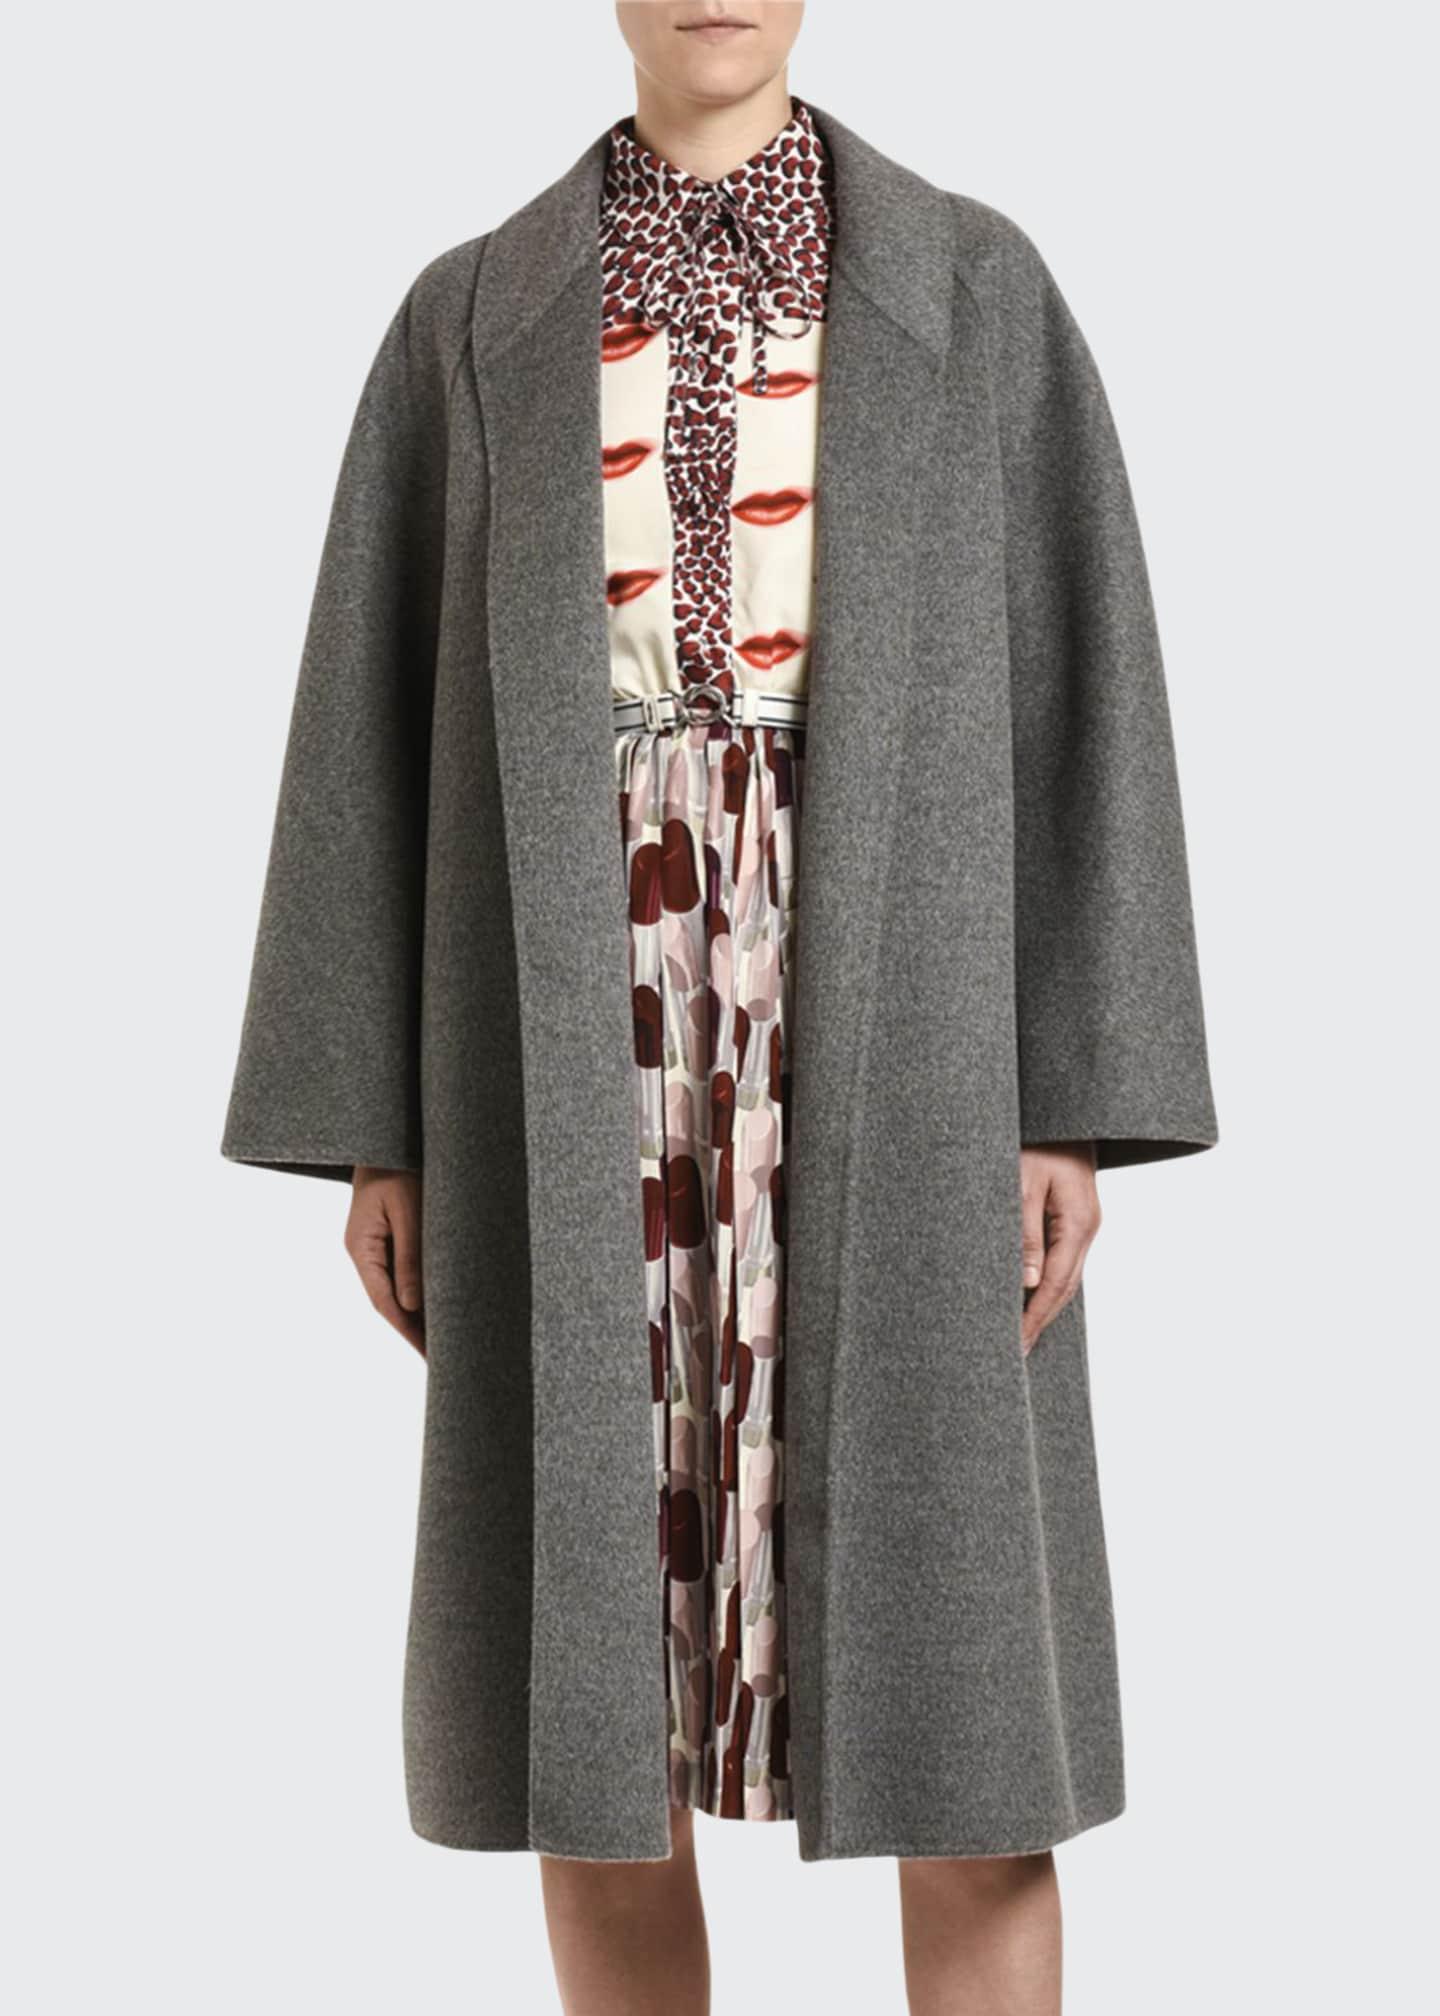 Prada Cashmere-Angora Opera Coat